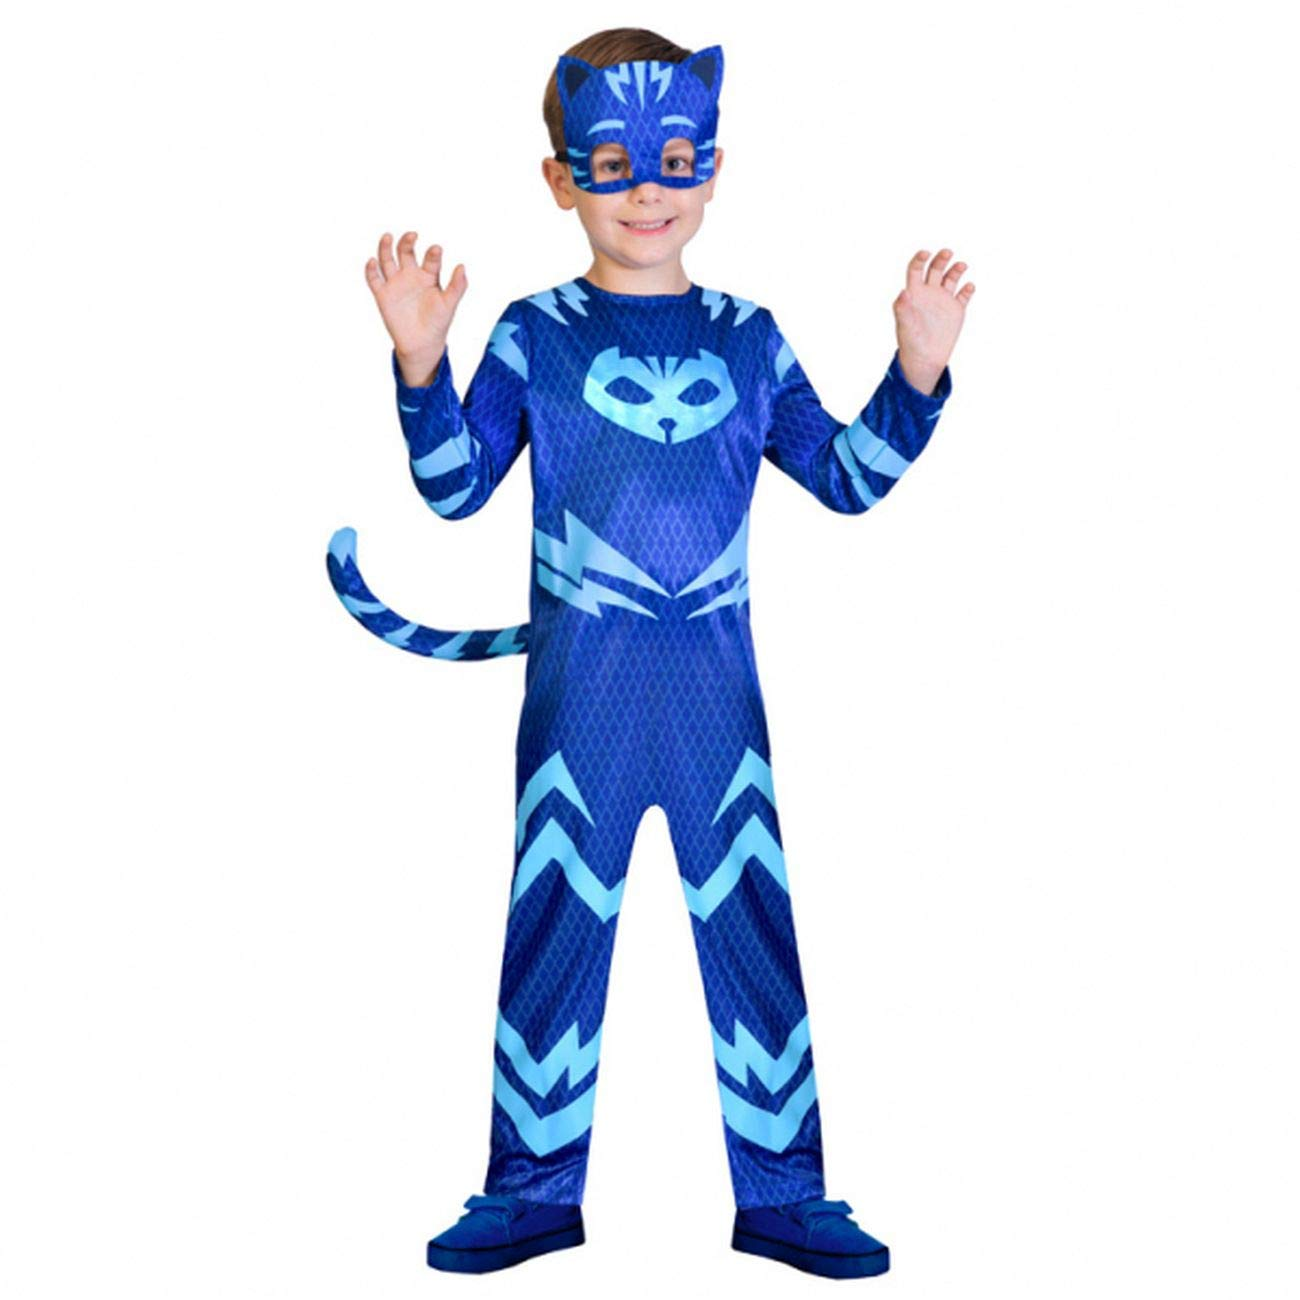 Azul Amscan pjmasques yoyo-Catboy Deguisement 9902952